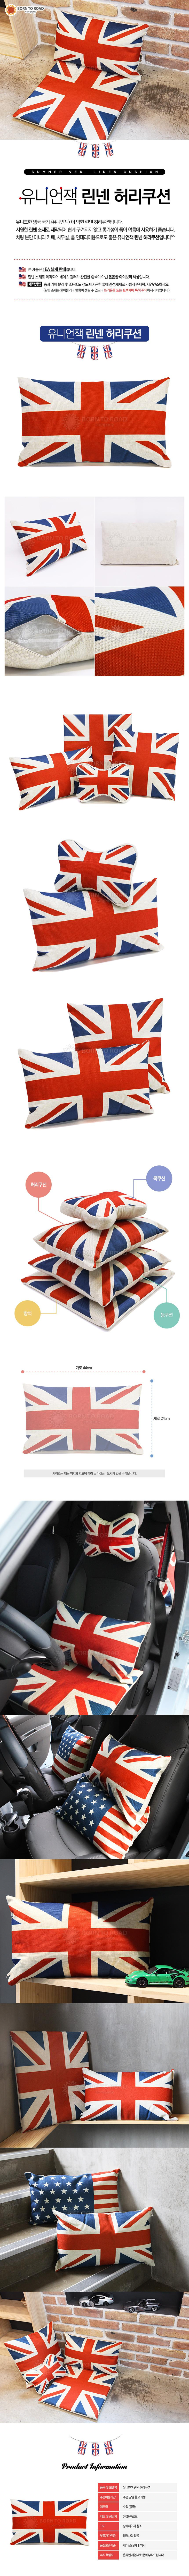 unionjack_linen_waist_cushion.jpg